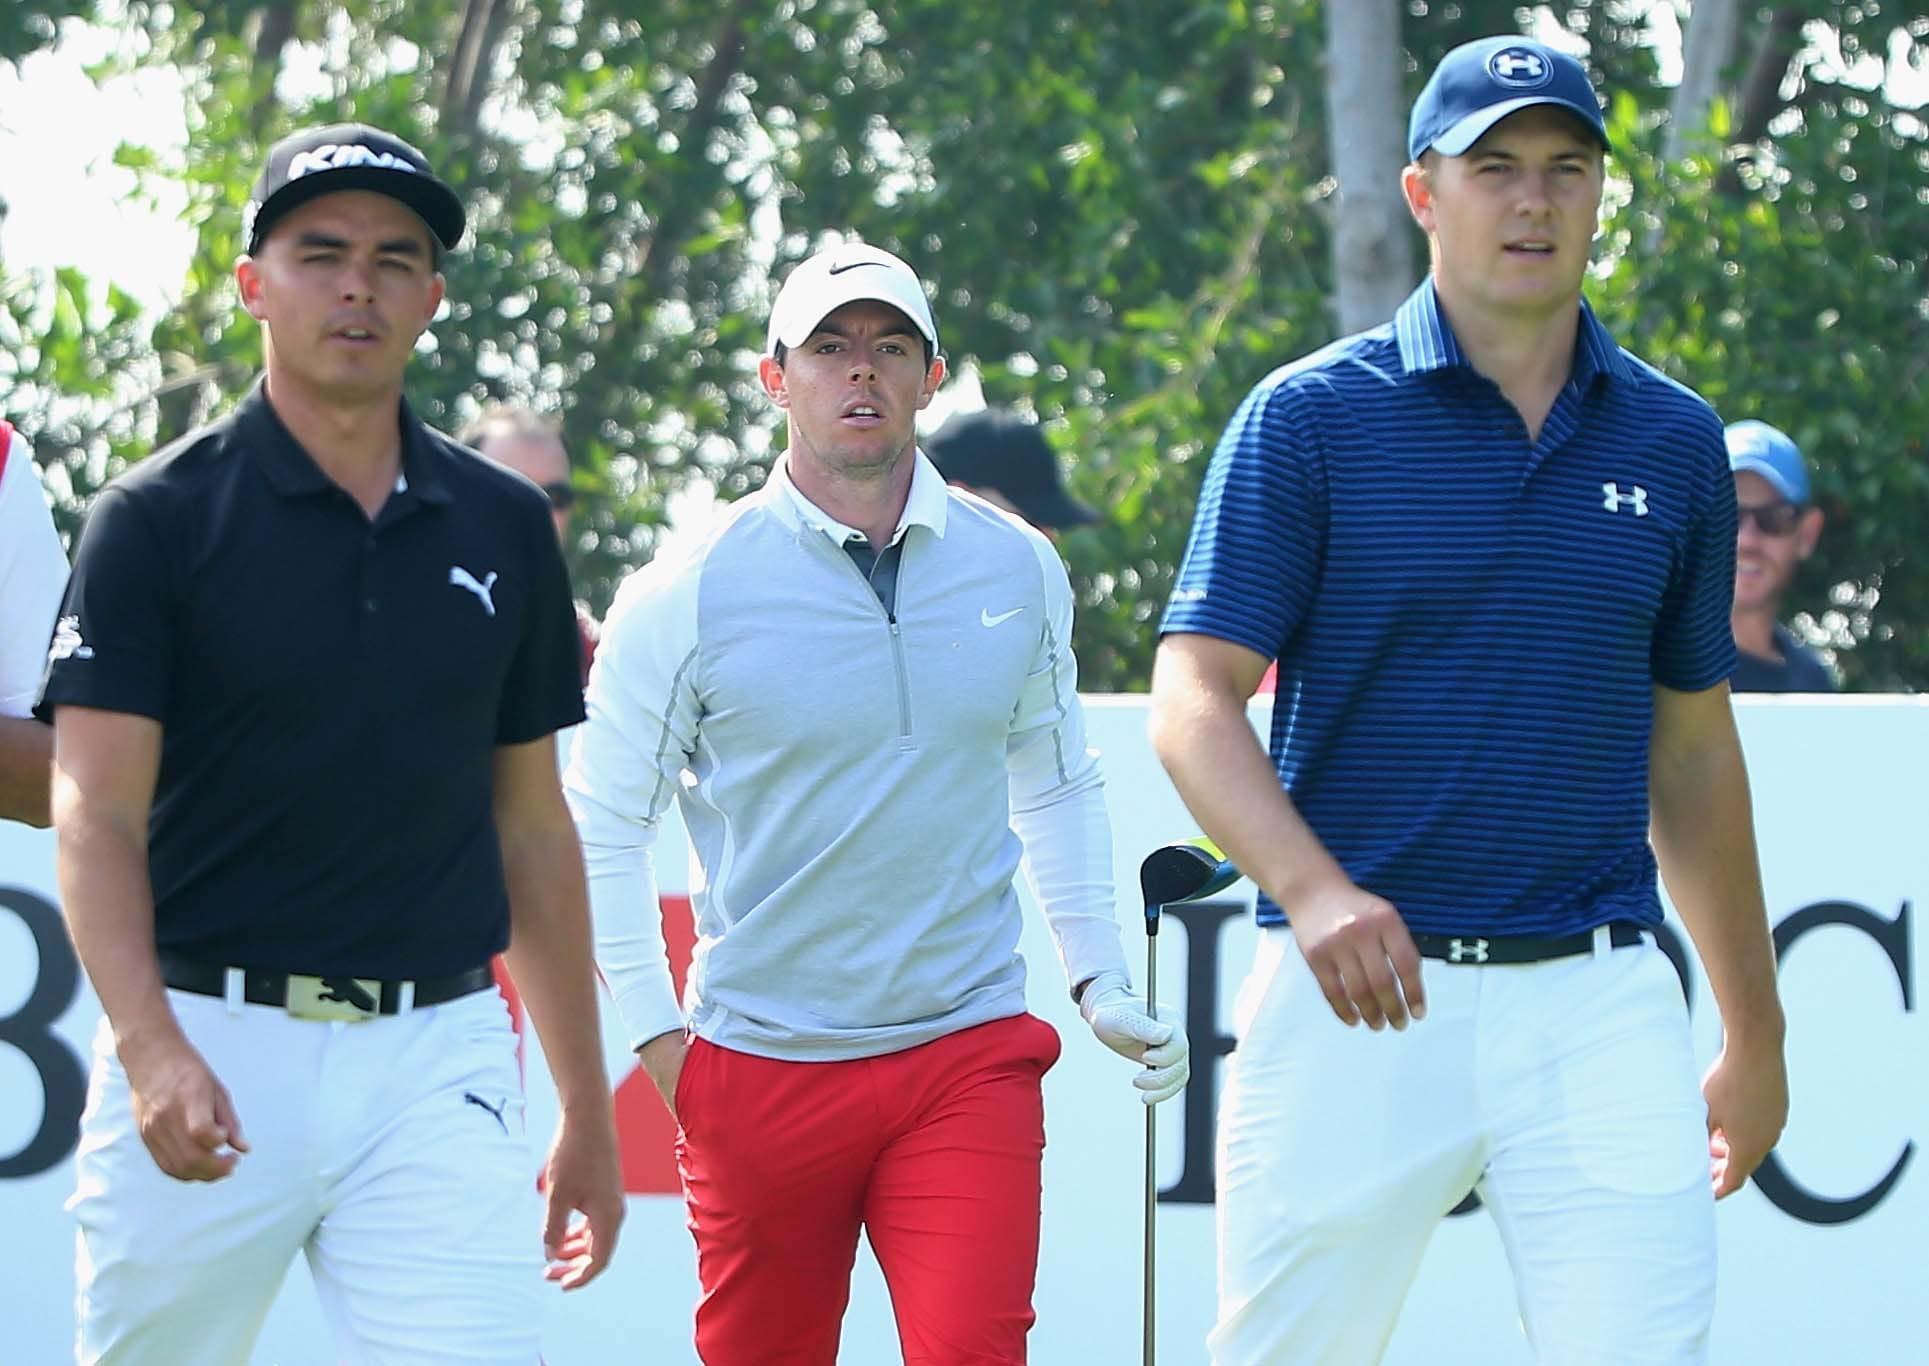 Rickie Fowler, Rory McIlroy and Jordan Spieth